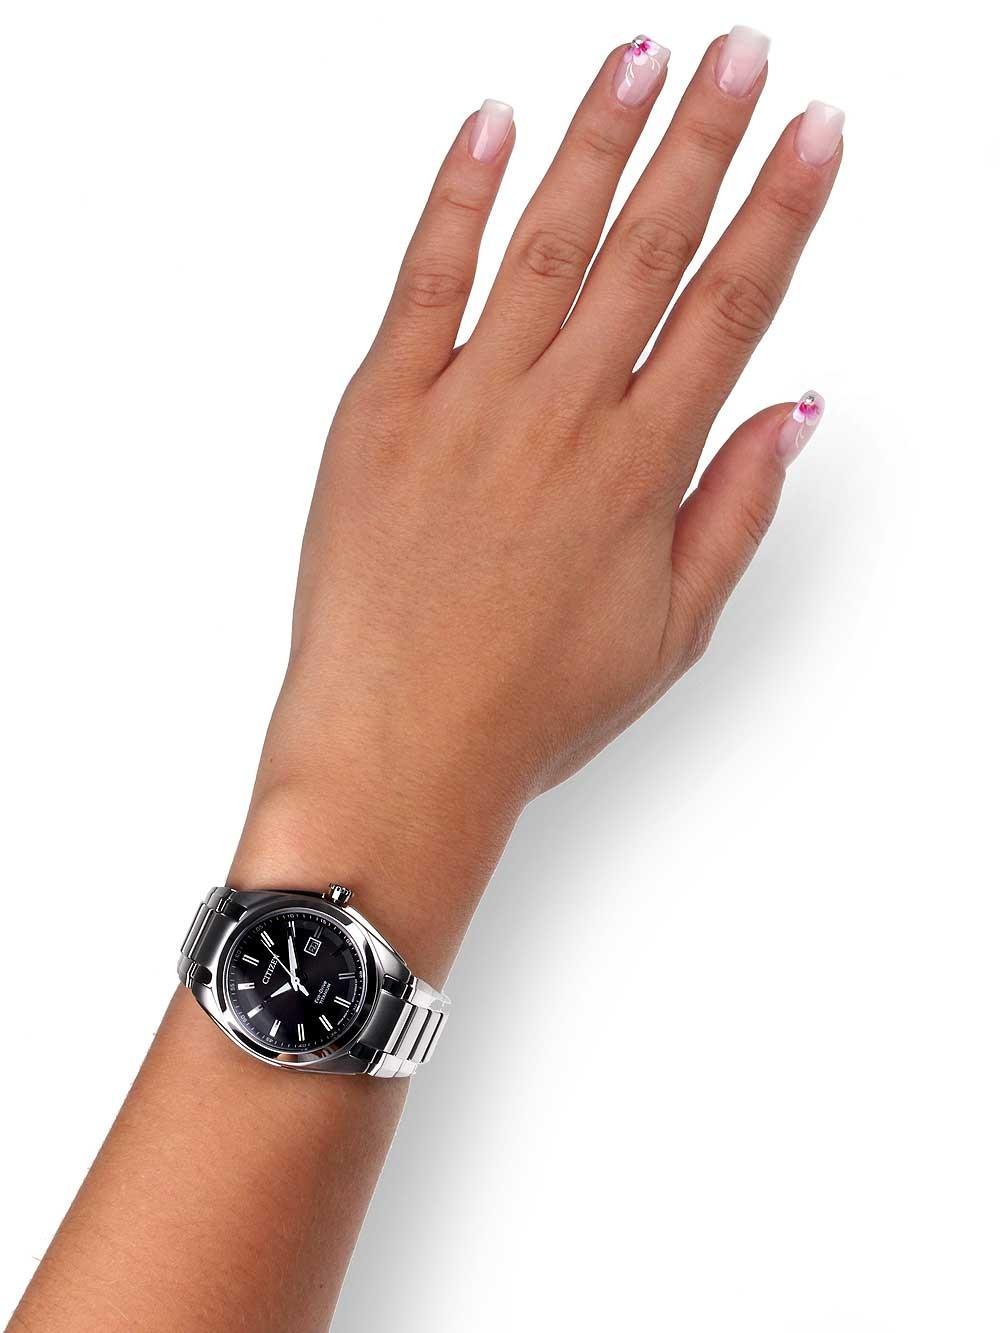 Watches | Chrono12 - Citizen EW2210-53E Super Titanium Eco ...